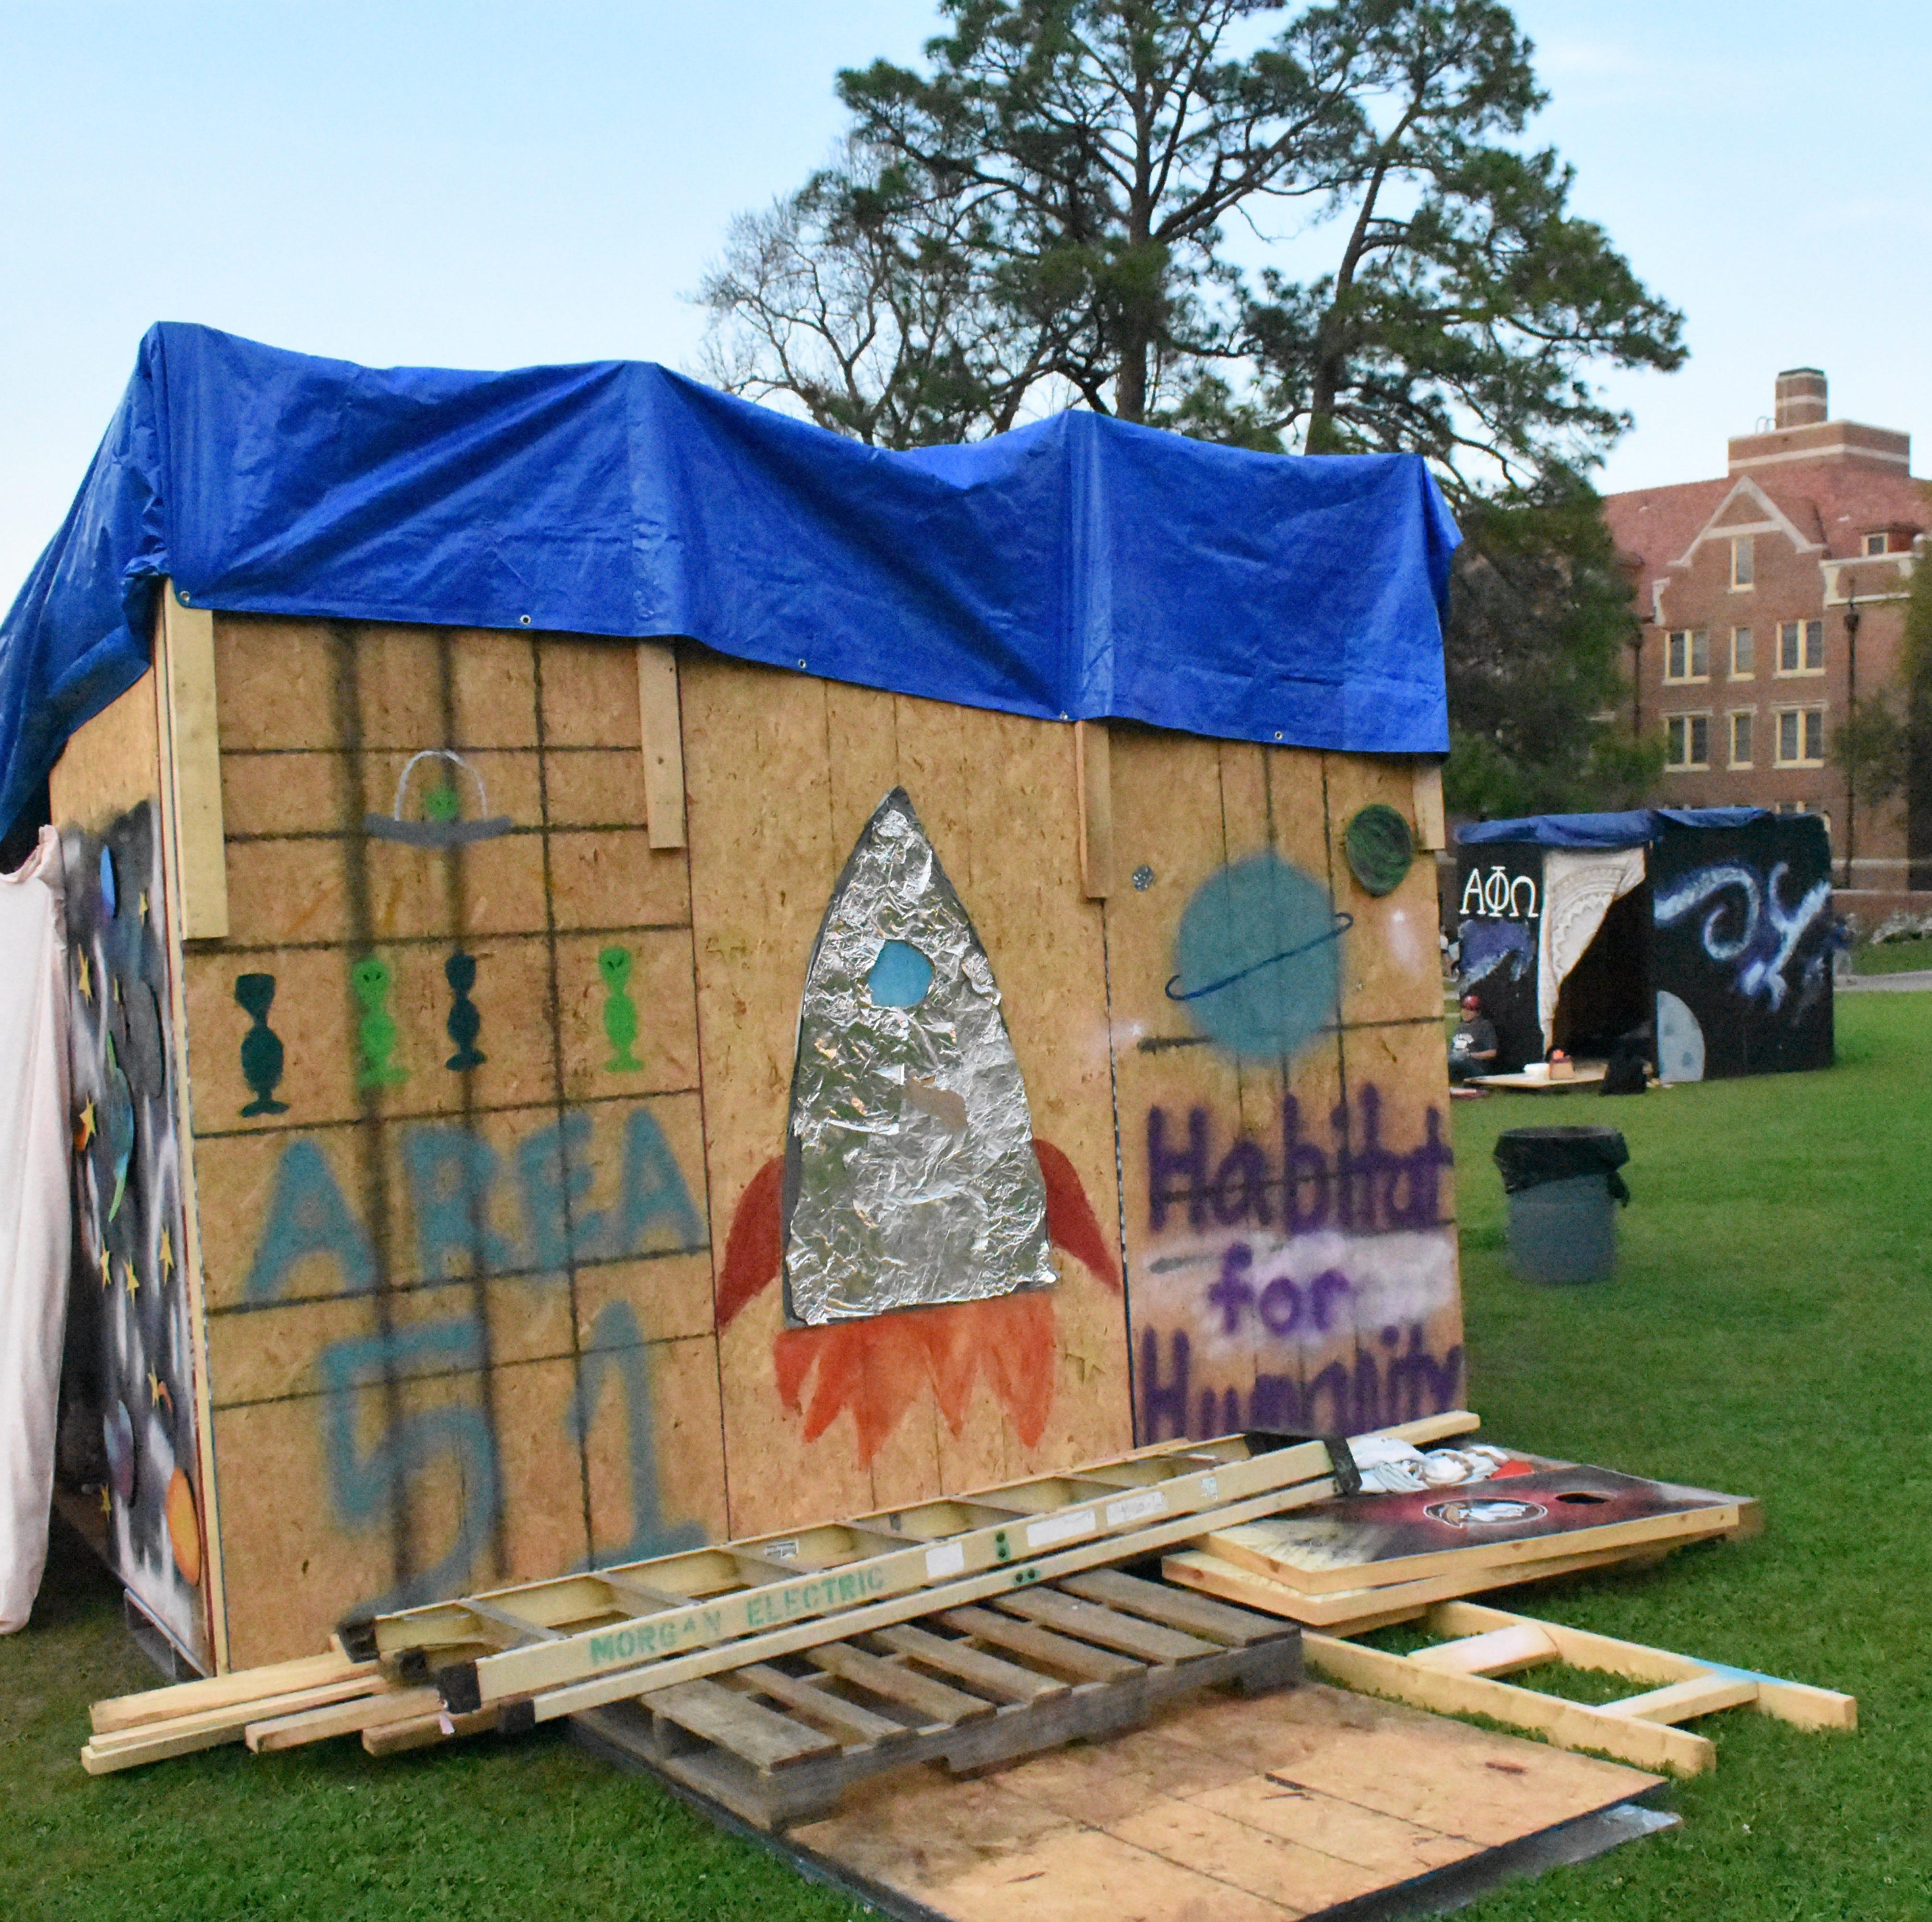 Students raise awareness for substandard housing crisis